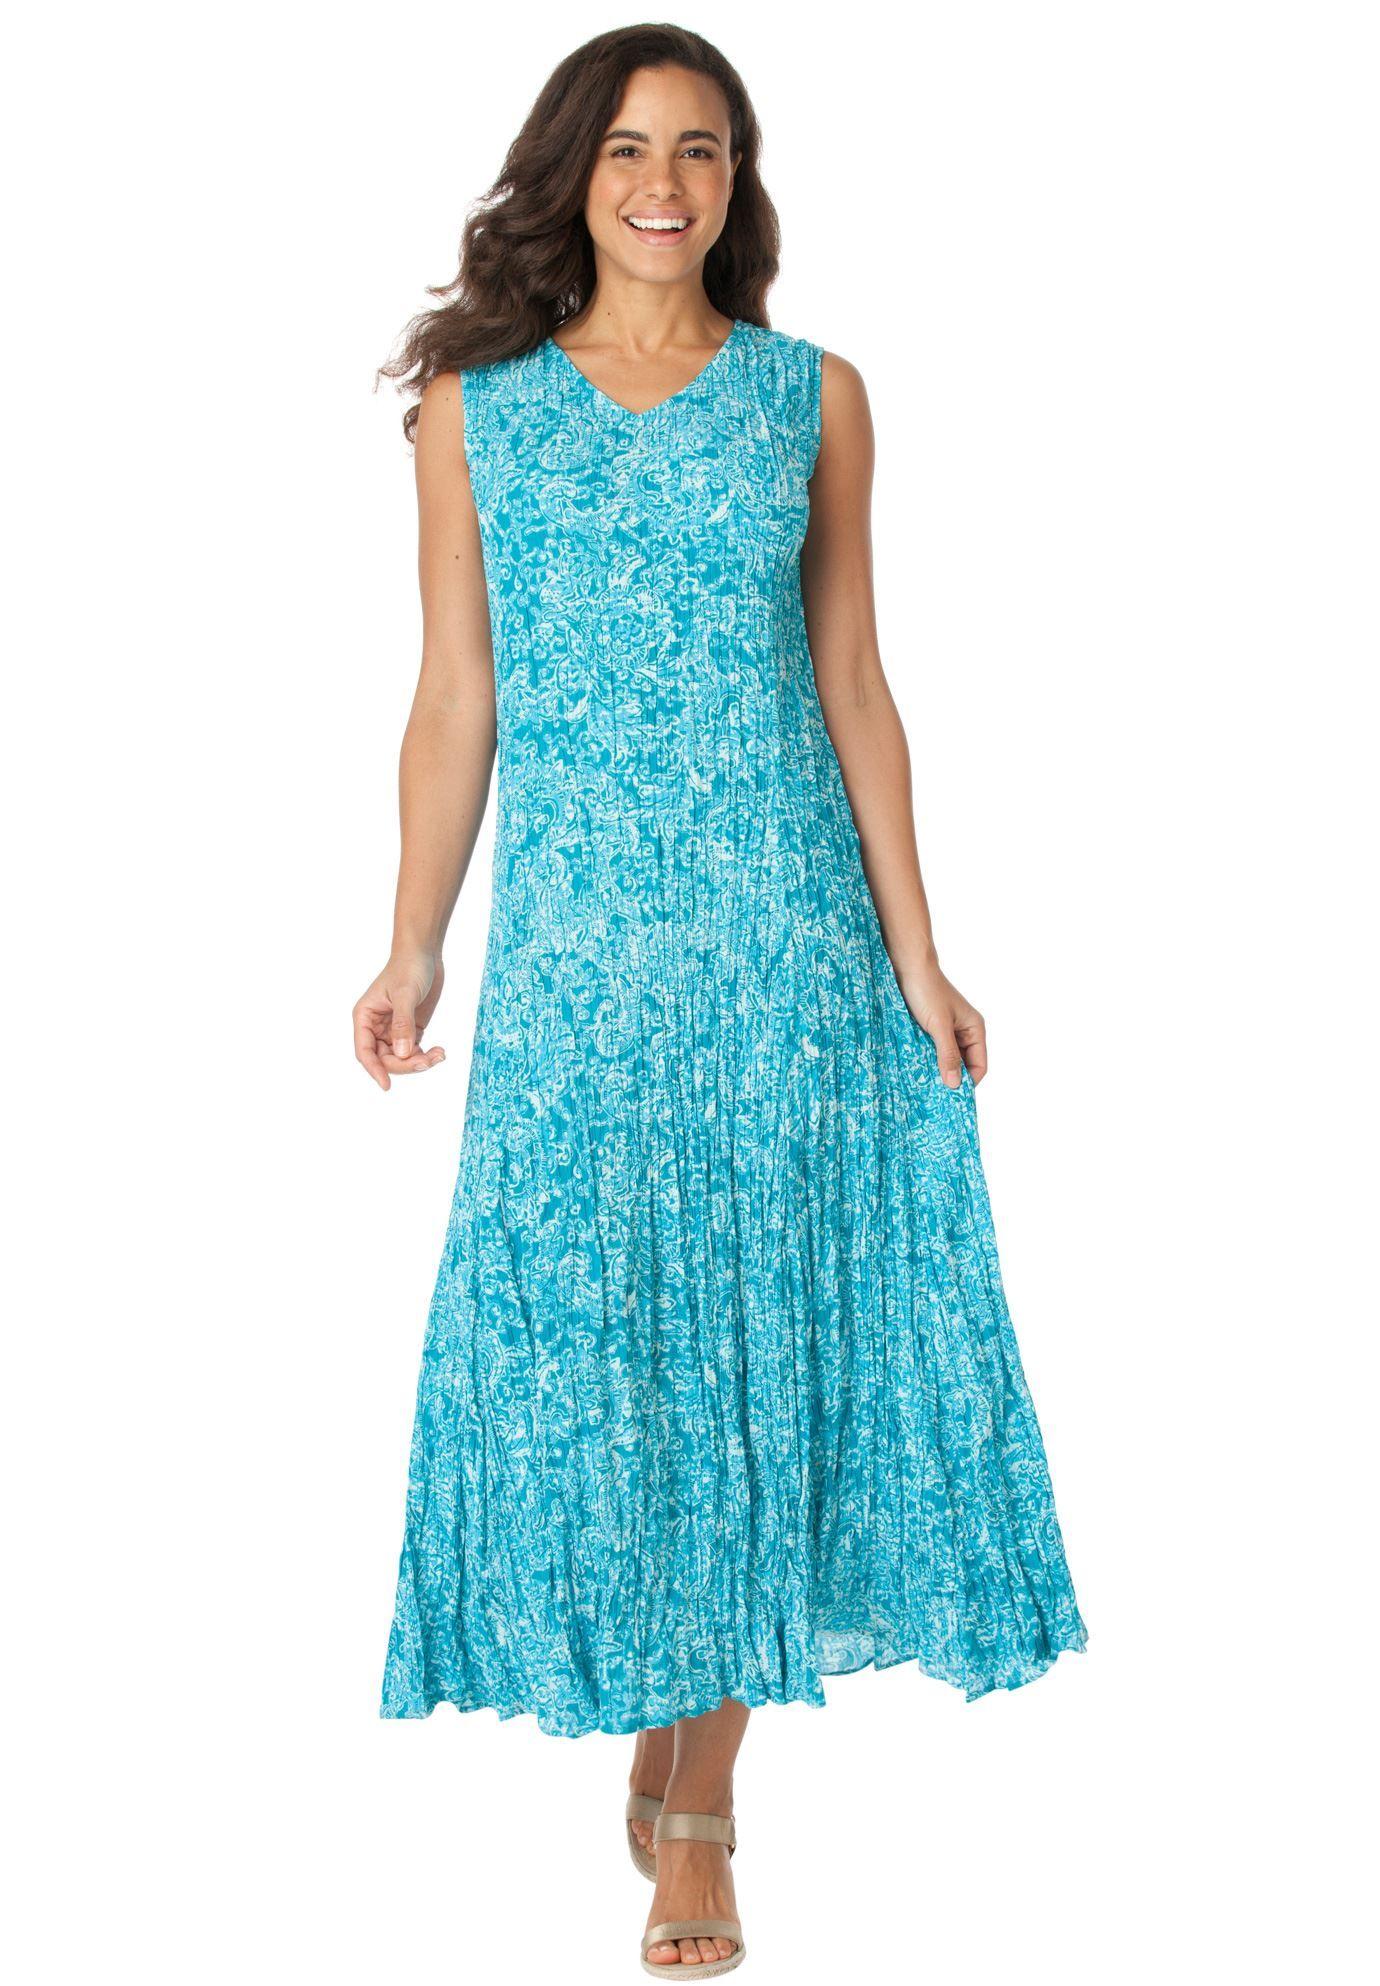 Good fabrics for summer dresses